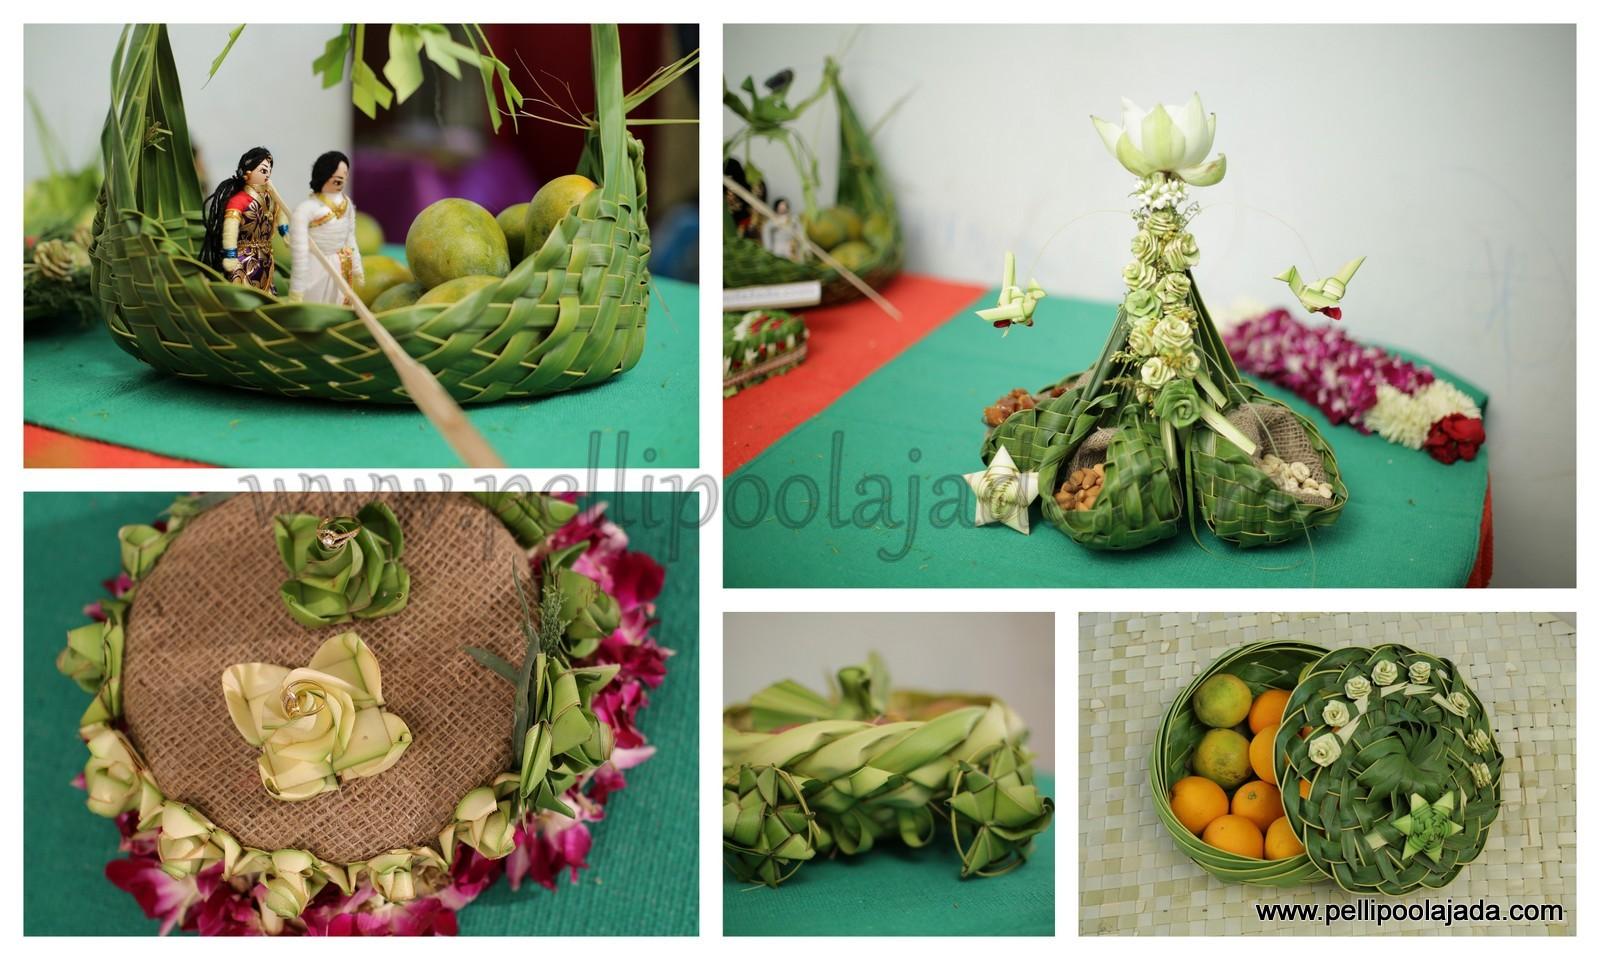 Telugu bride with kobbari bondam pelli poola jada coconut leaf baskets and trays for wedding packing and trousseau packing junglespirit Gallery